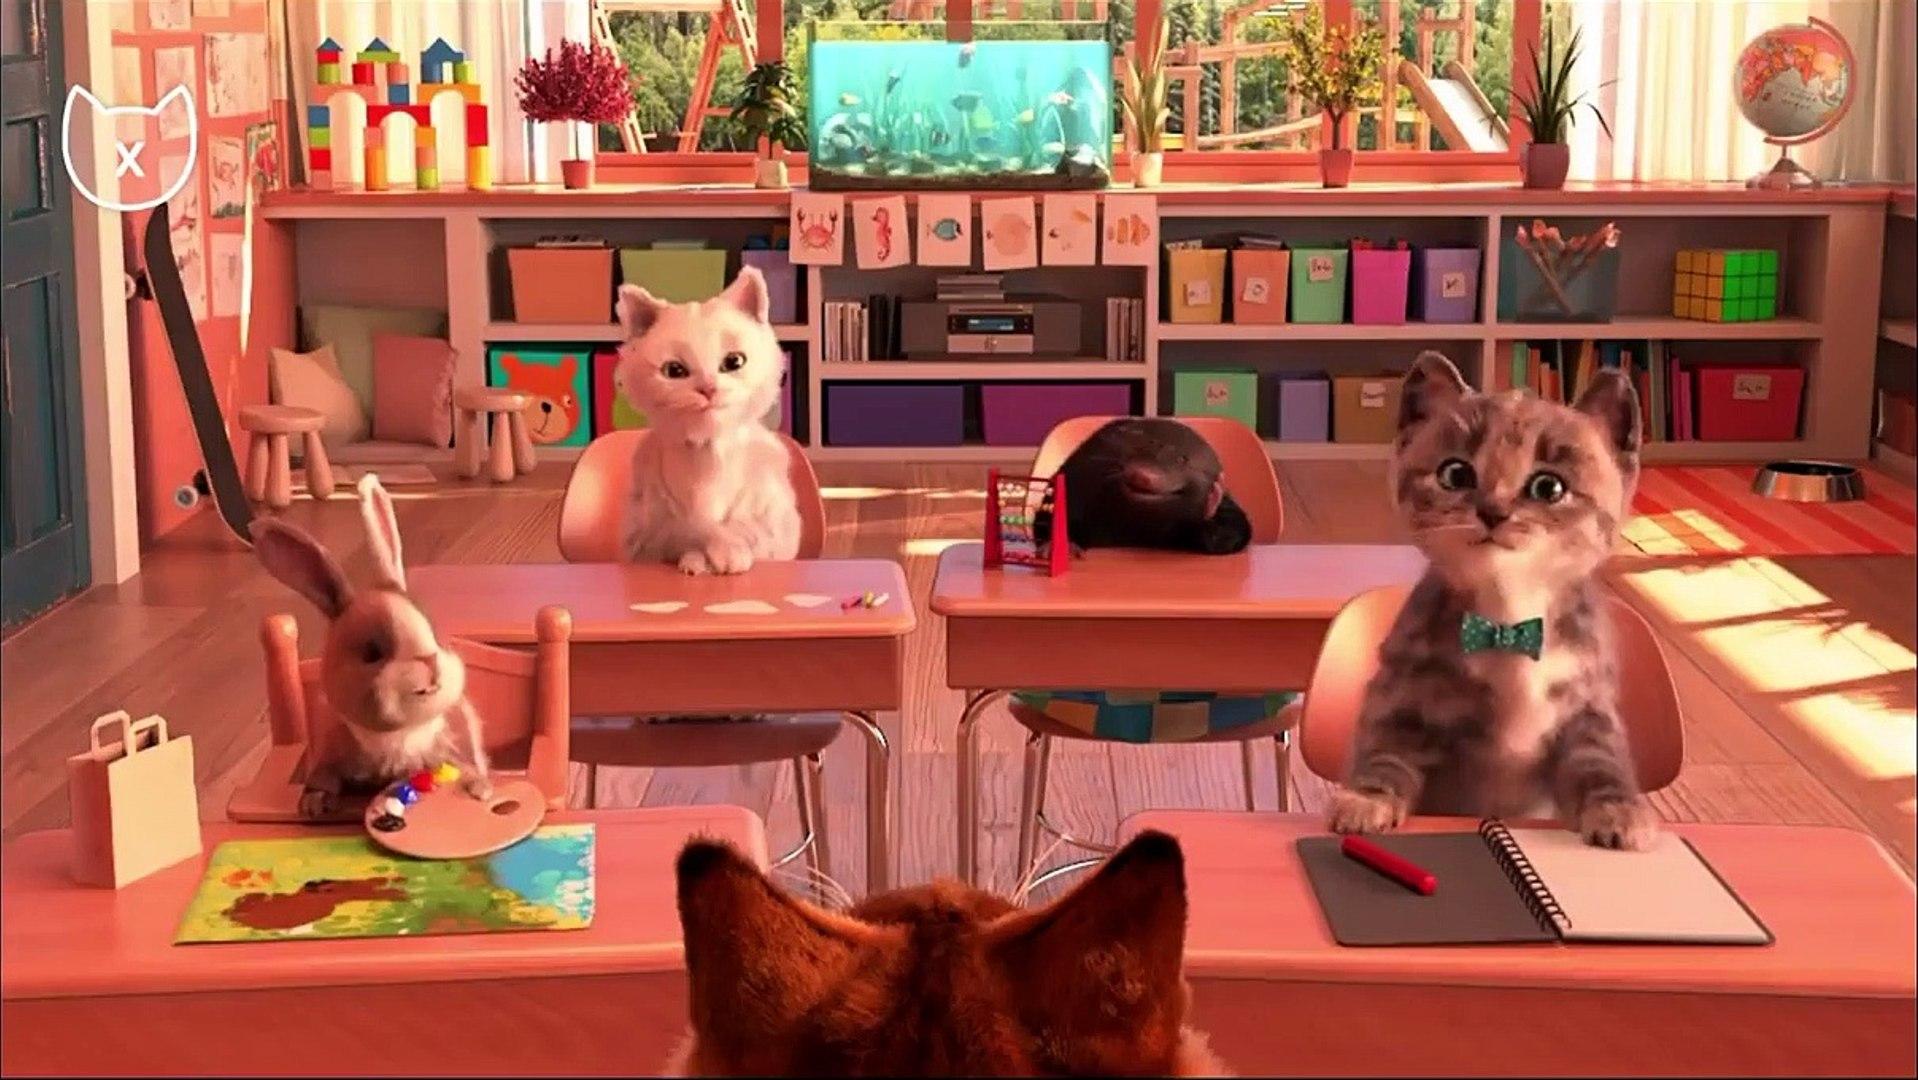 Little Kitten Preschool Kids Game Play Fun Early Learning Education For Kids Children Toddlers